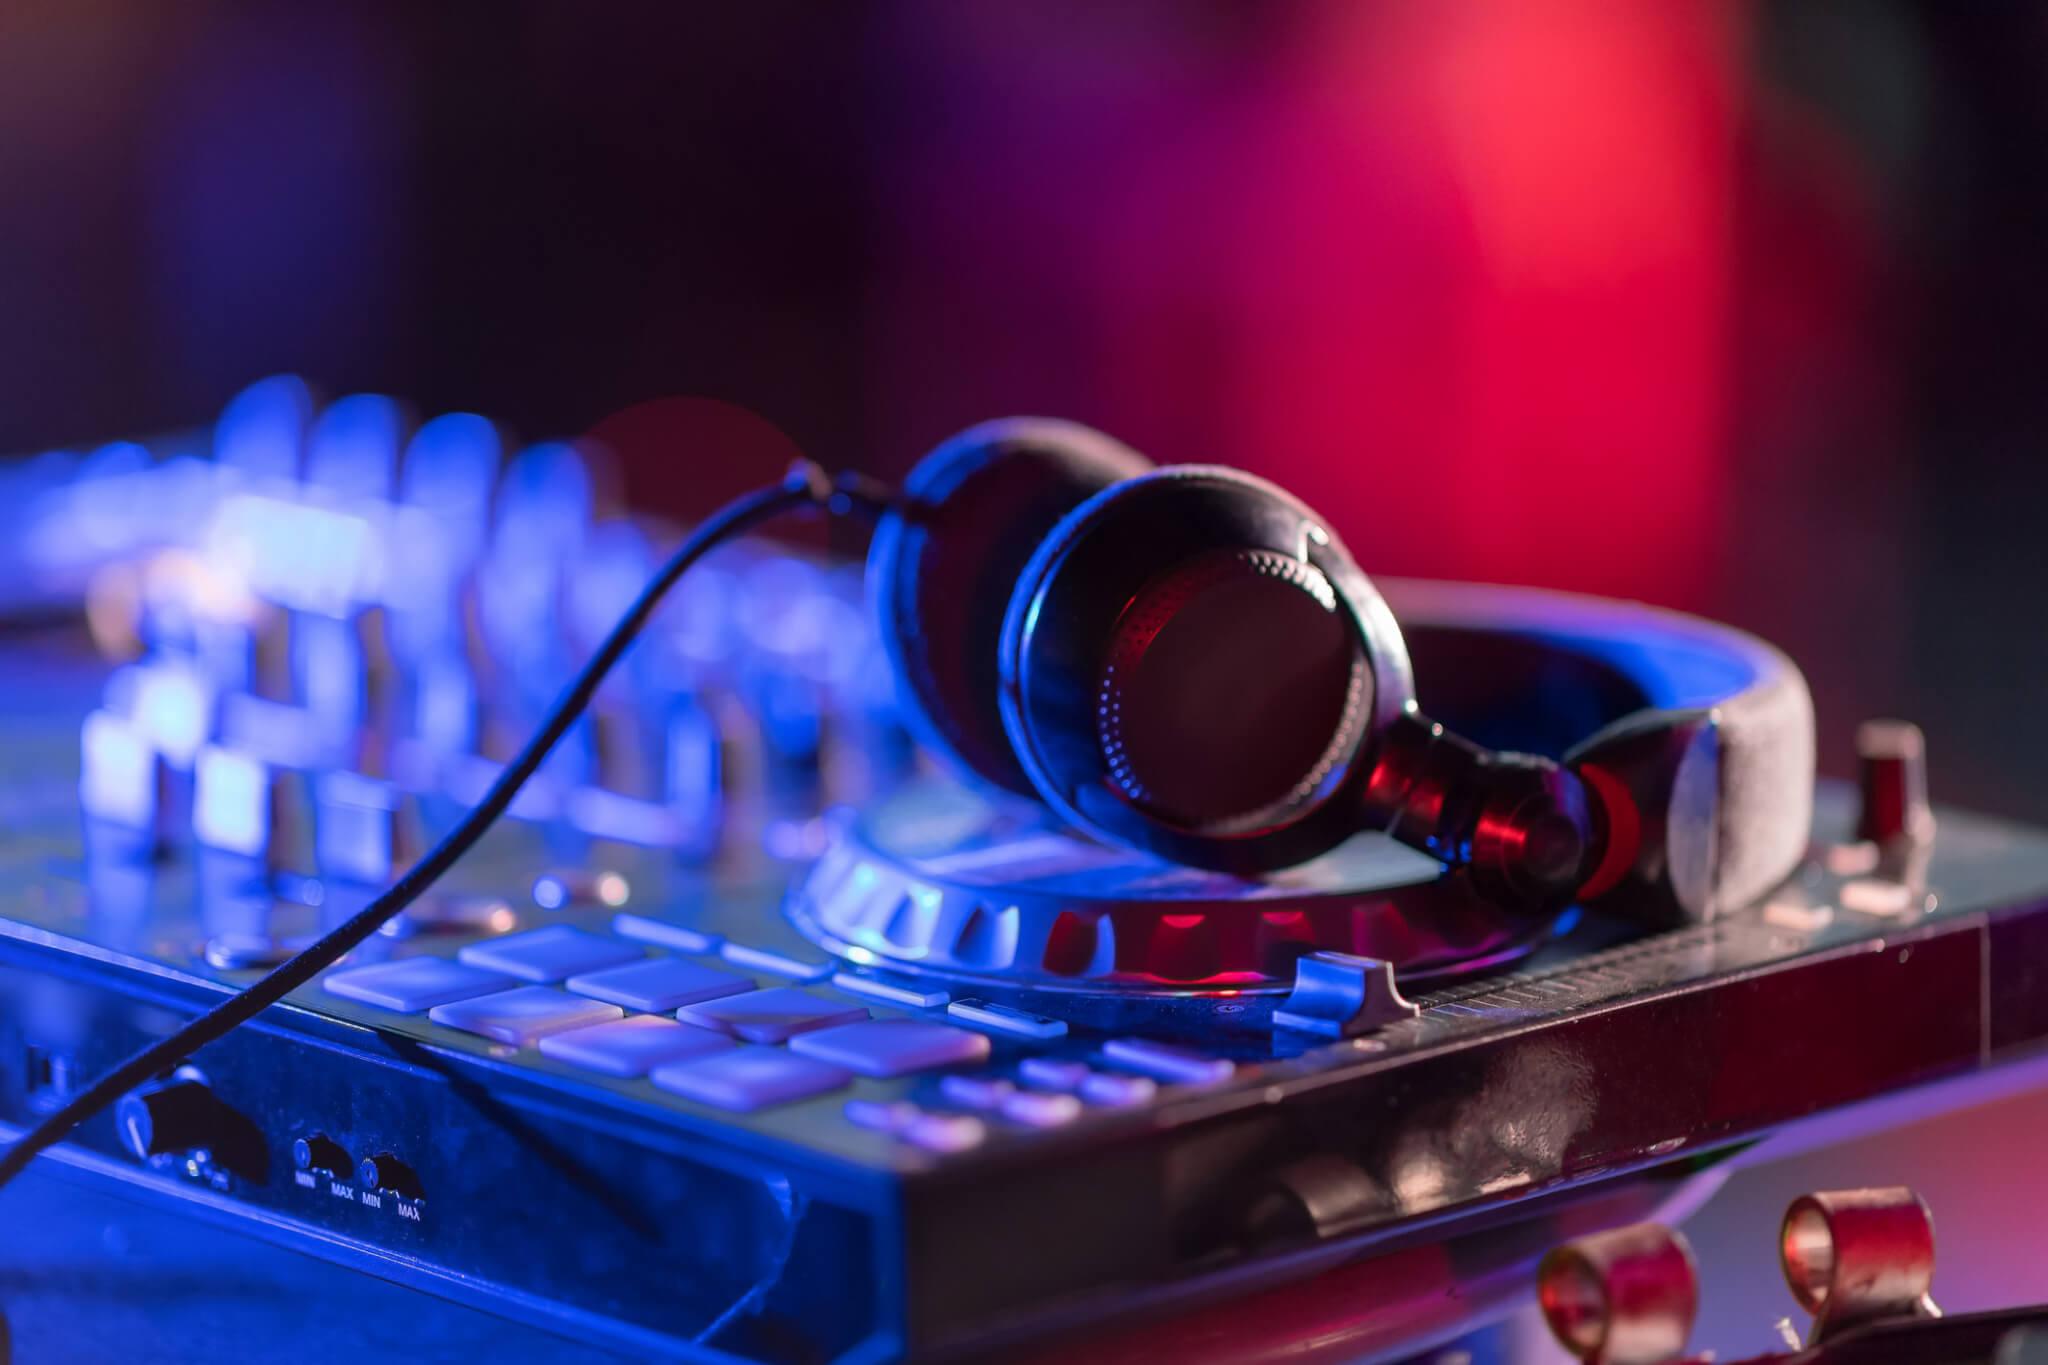 Wedding DJ console with Headphones